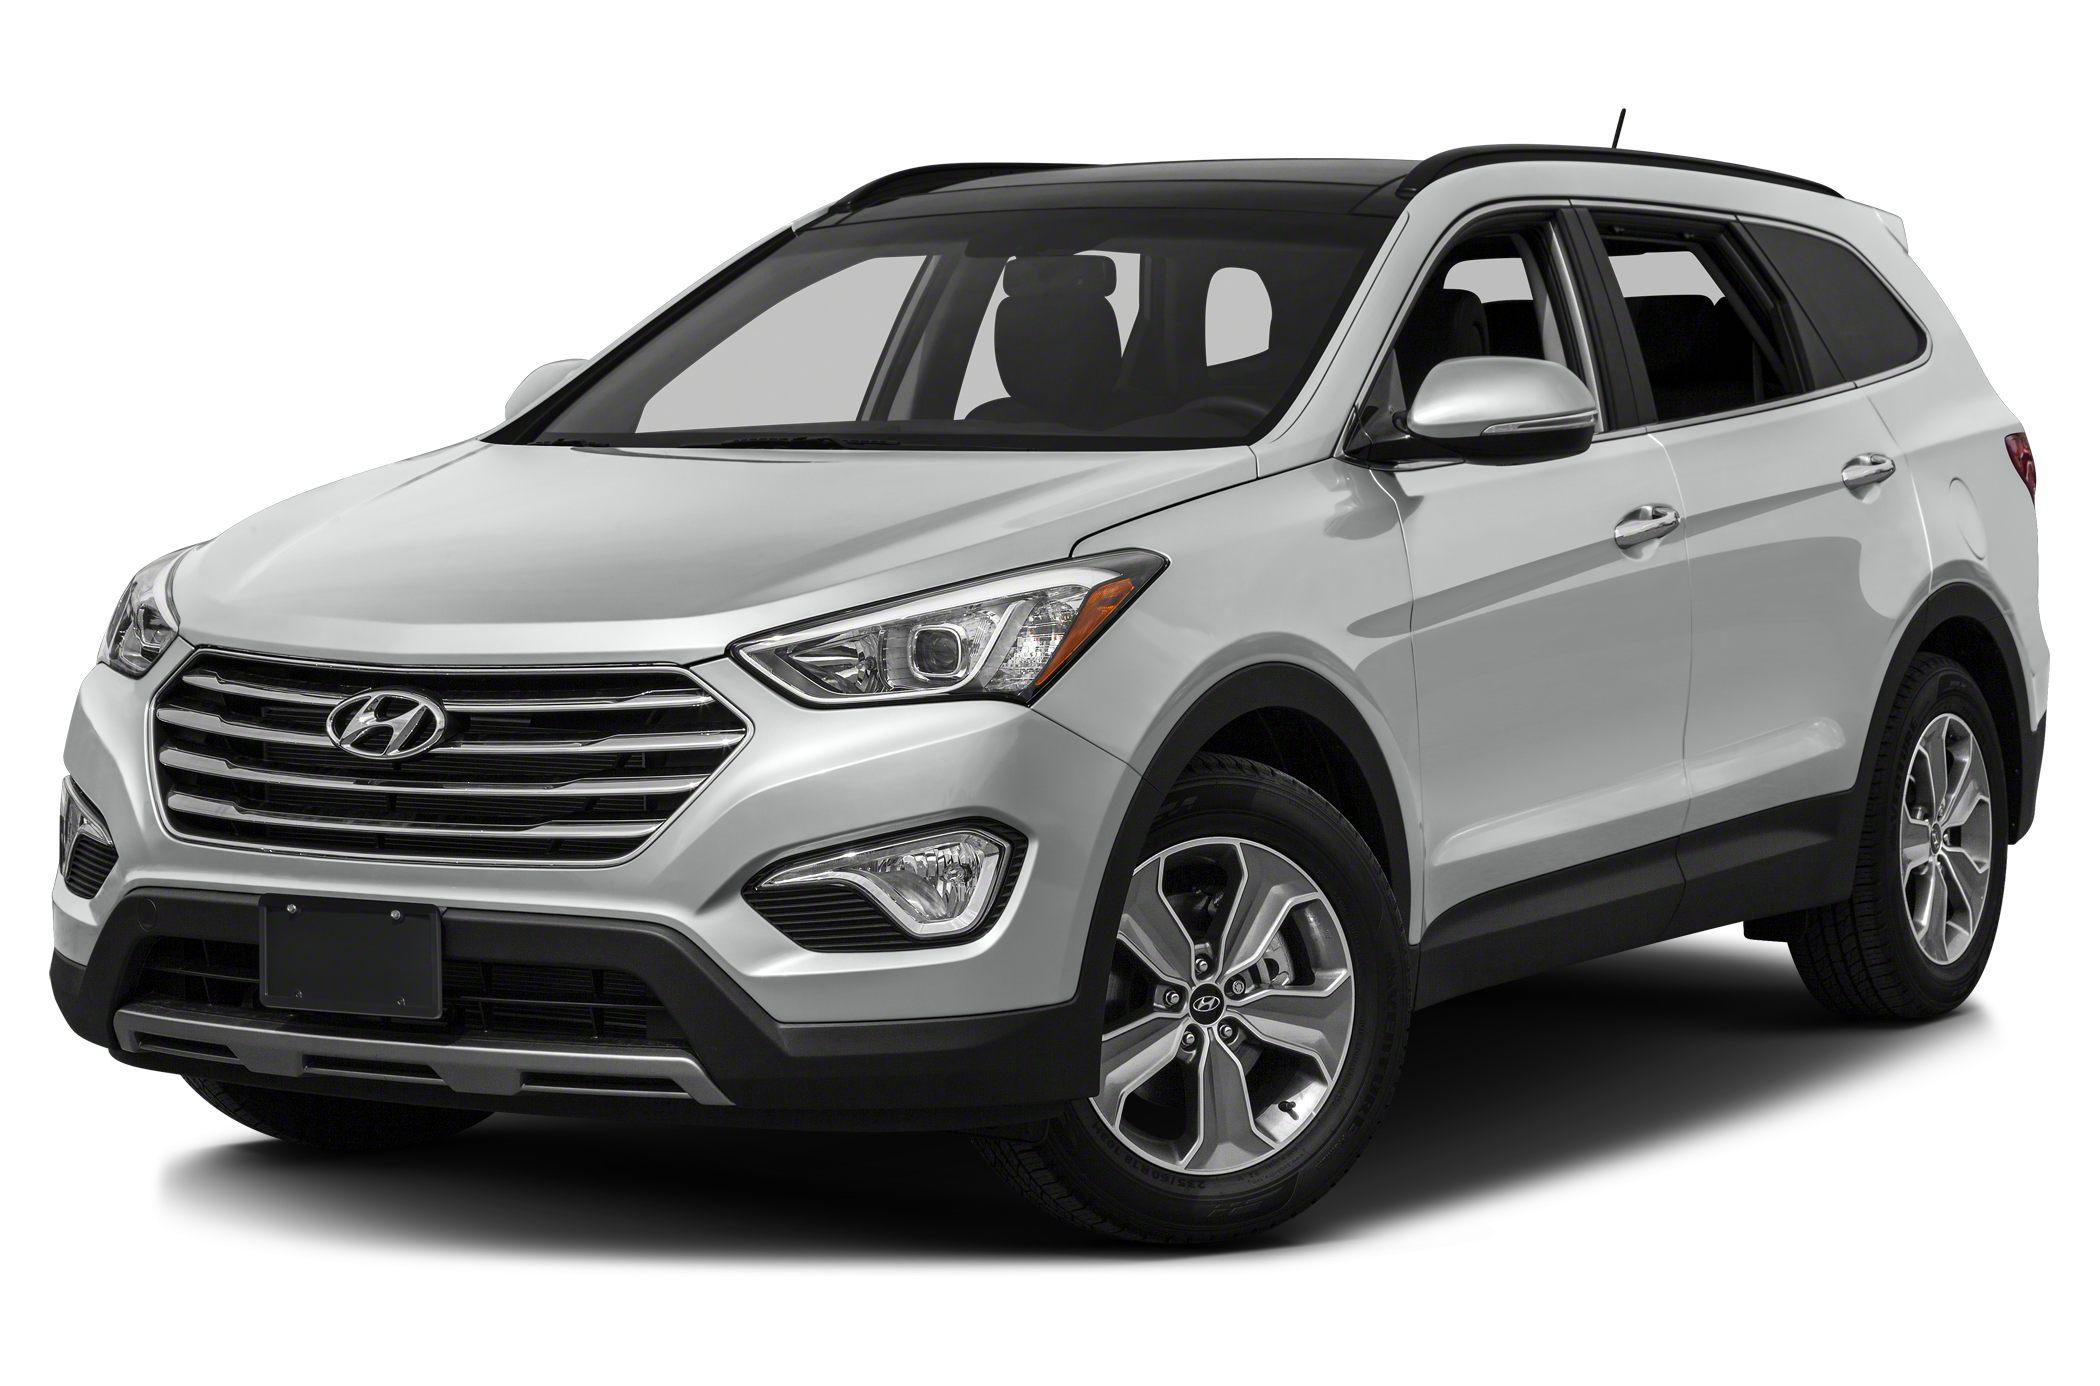 2014 Hyundai Santa Fe Sport Home of the 20yr200k mile warranty Miles 3Color Brown Stock 14H50